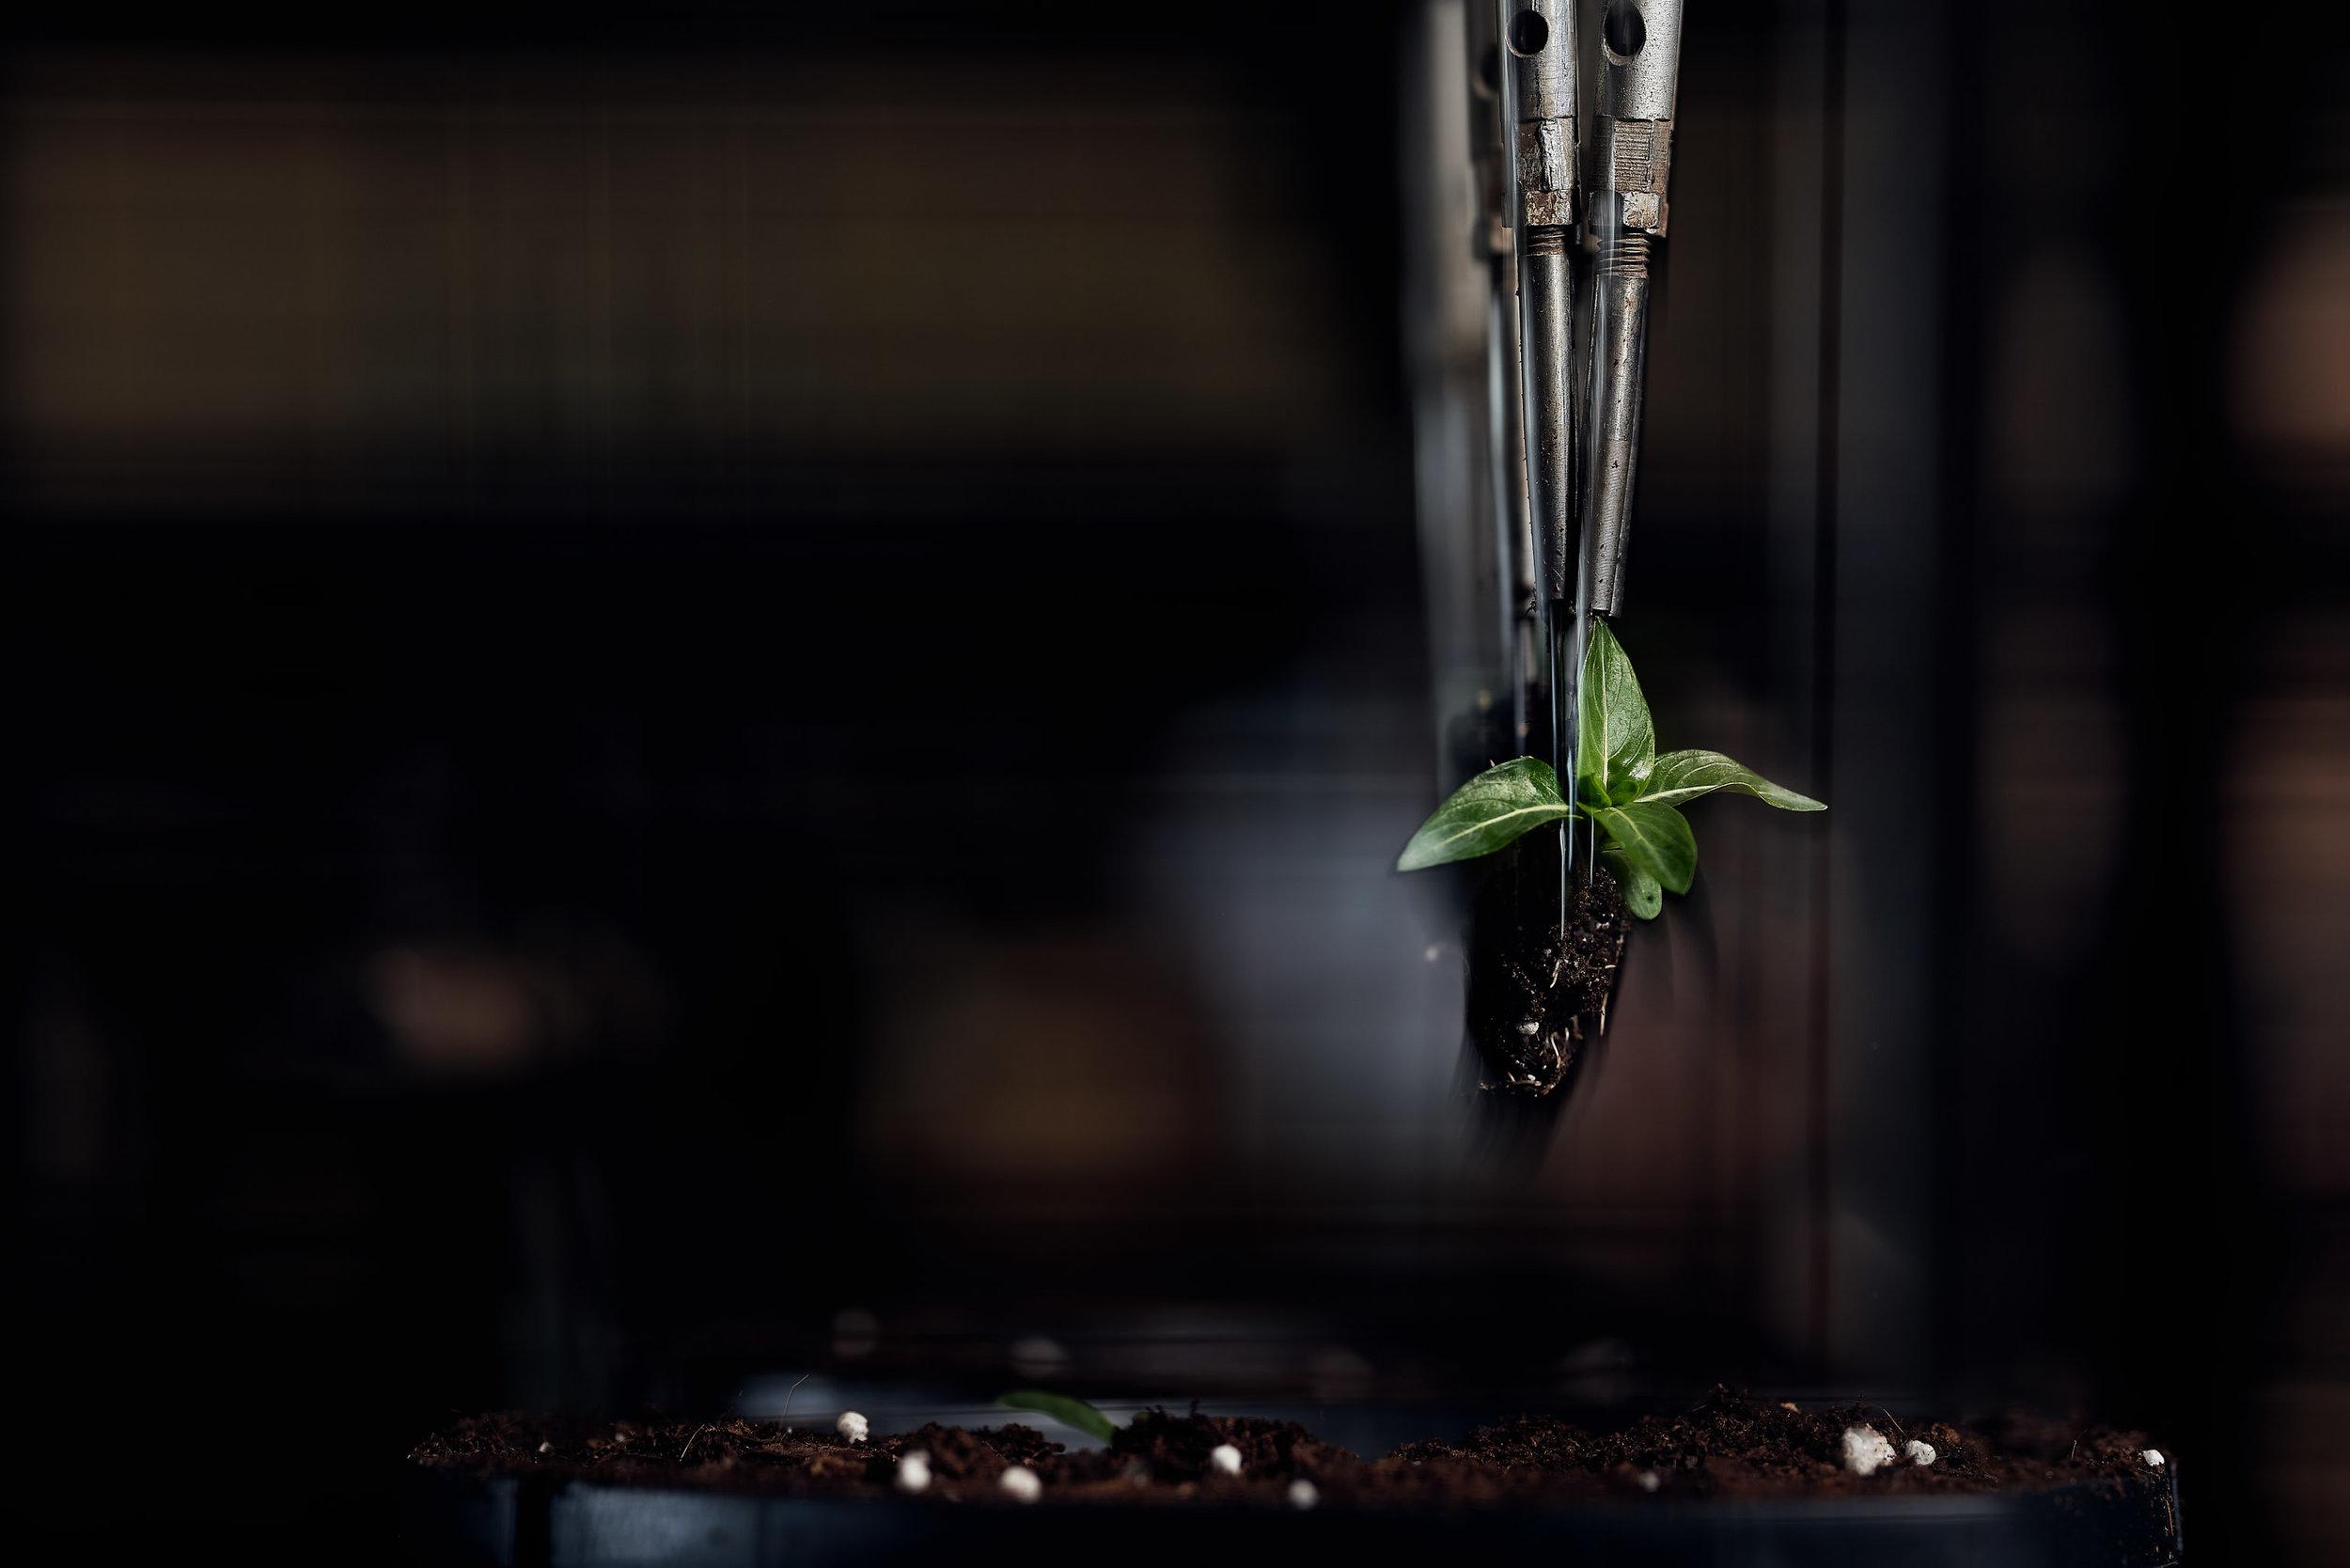 My Second Favorite Shot: Sony A7riii + Sigma Art 135mm